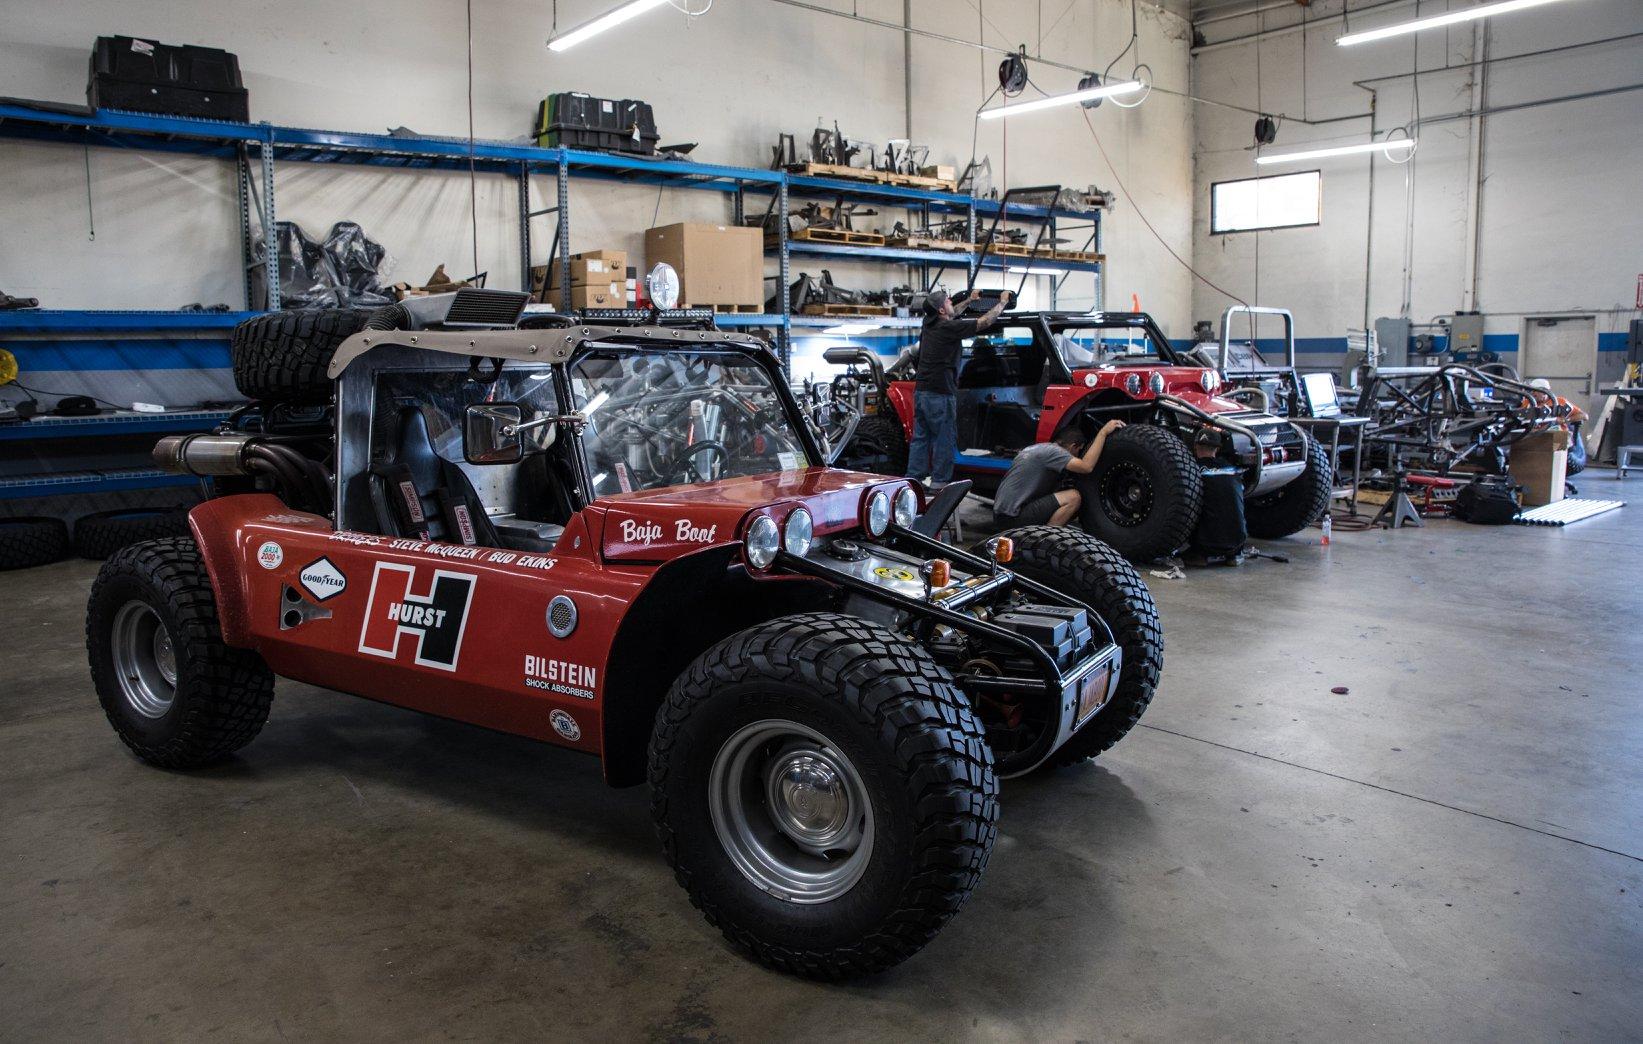 SCG-Baja-Boot-first-product-car-10